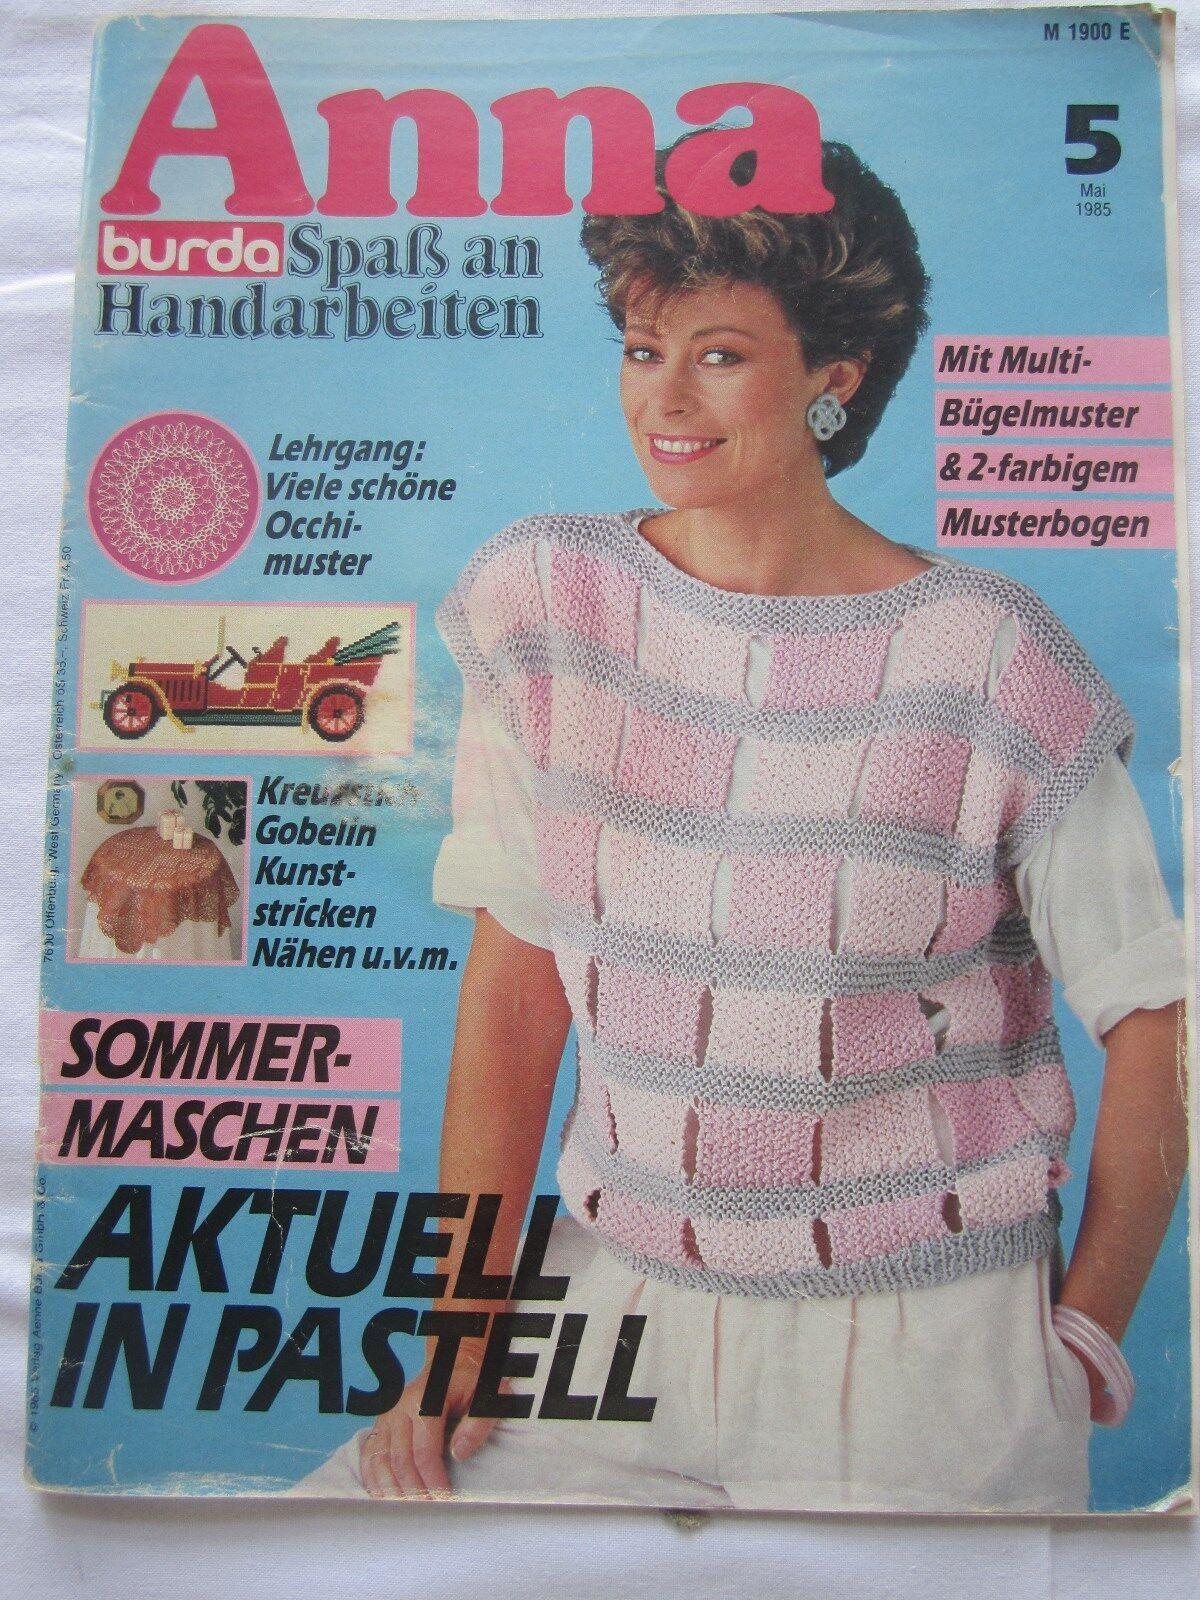 Anna Spass mit Handarbeiten Mai 1985